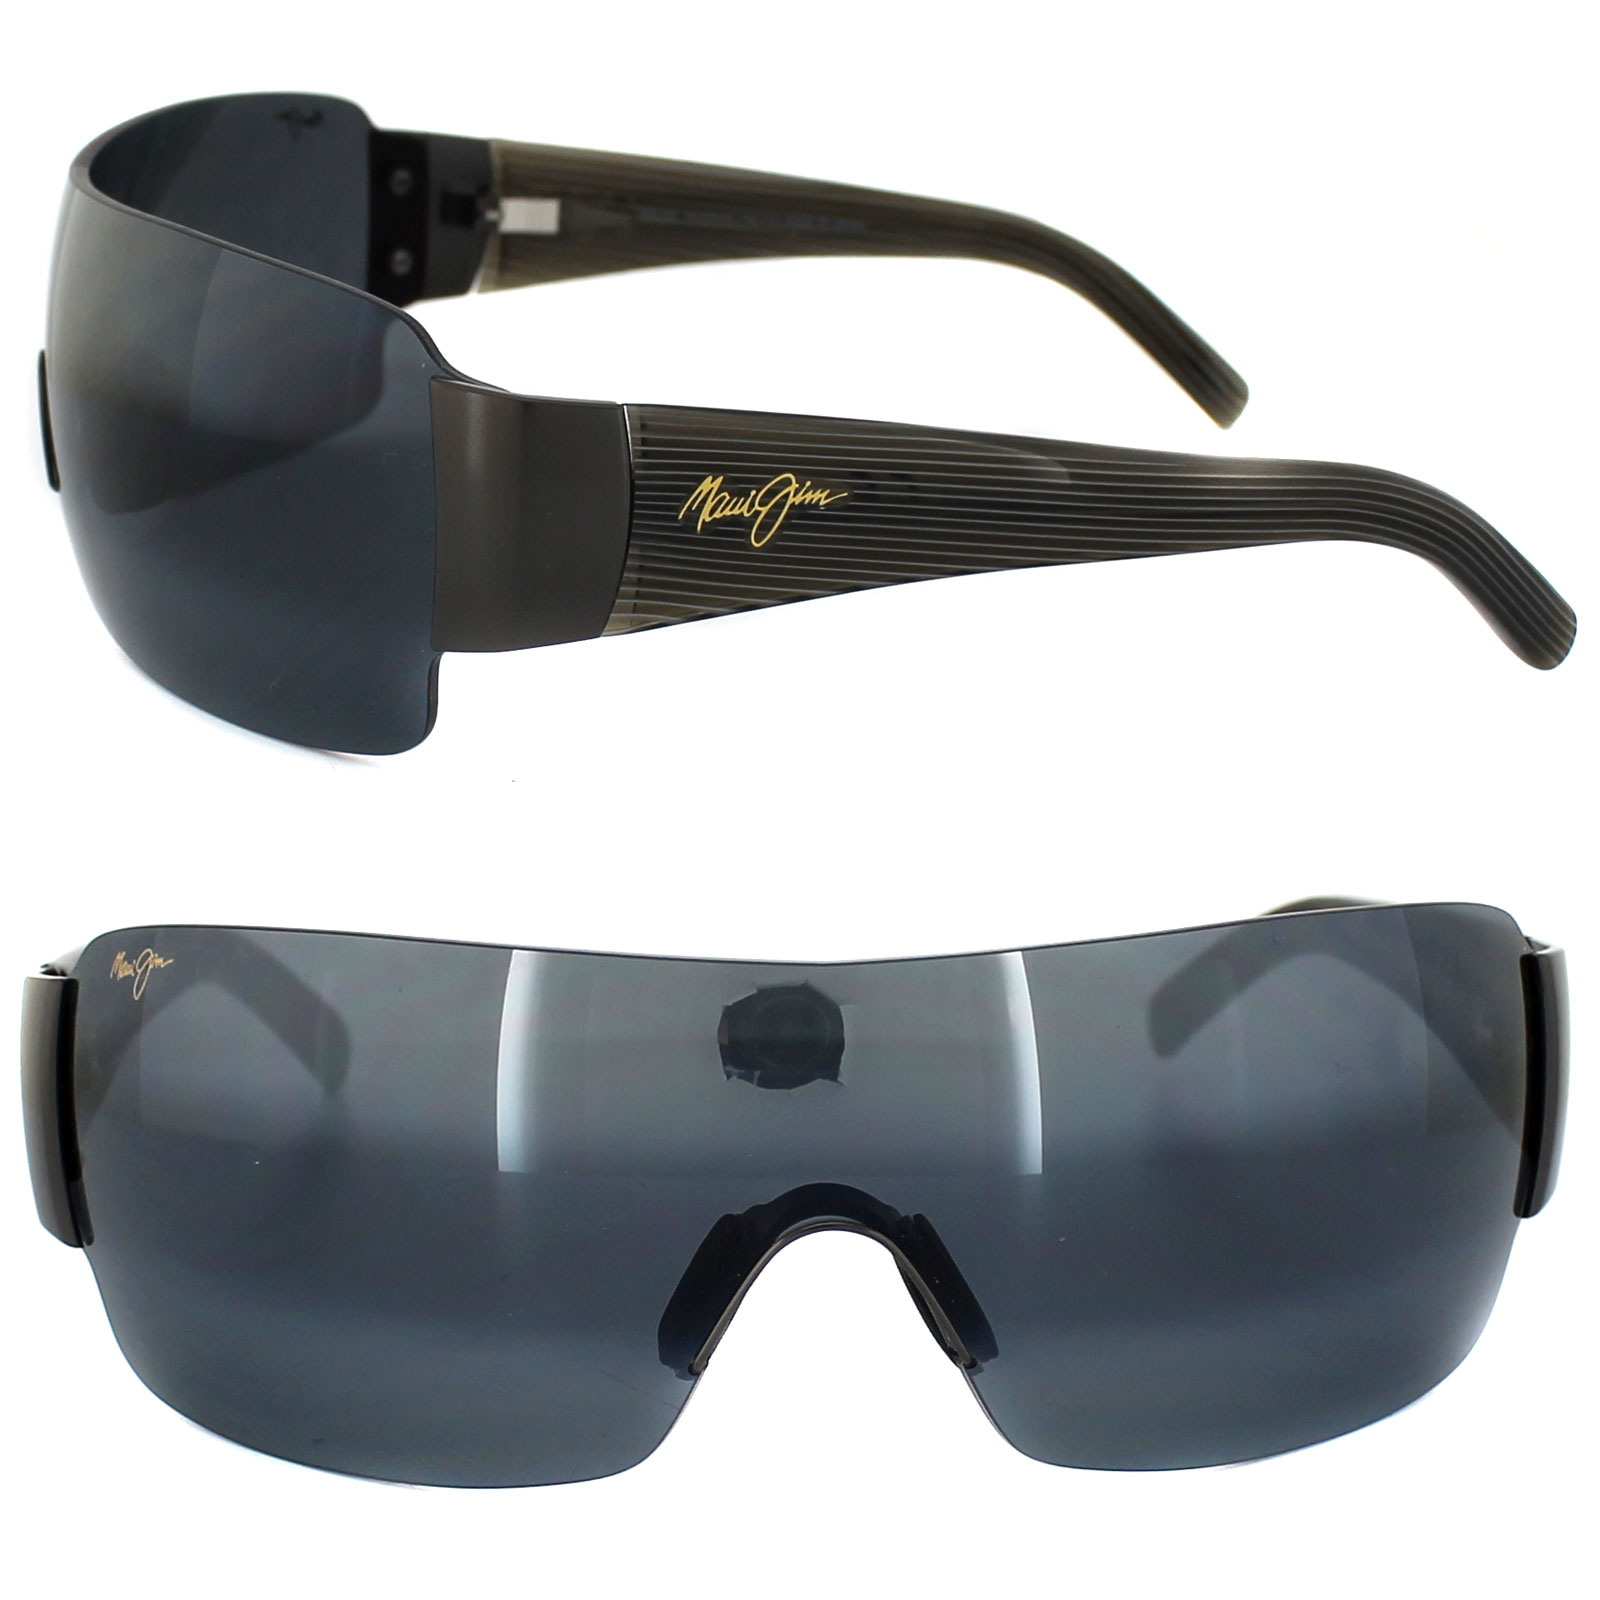 Maui Jim Sunglasses Ebay  maui jim sunglasses honolulu 520 02 gunmetal black temples